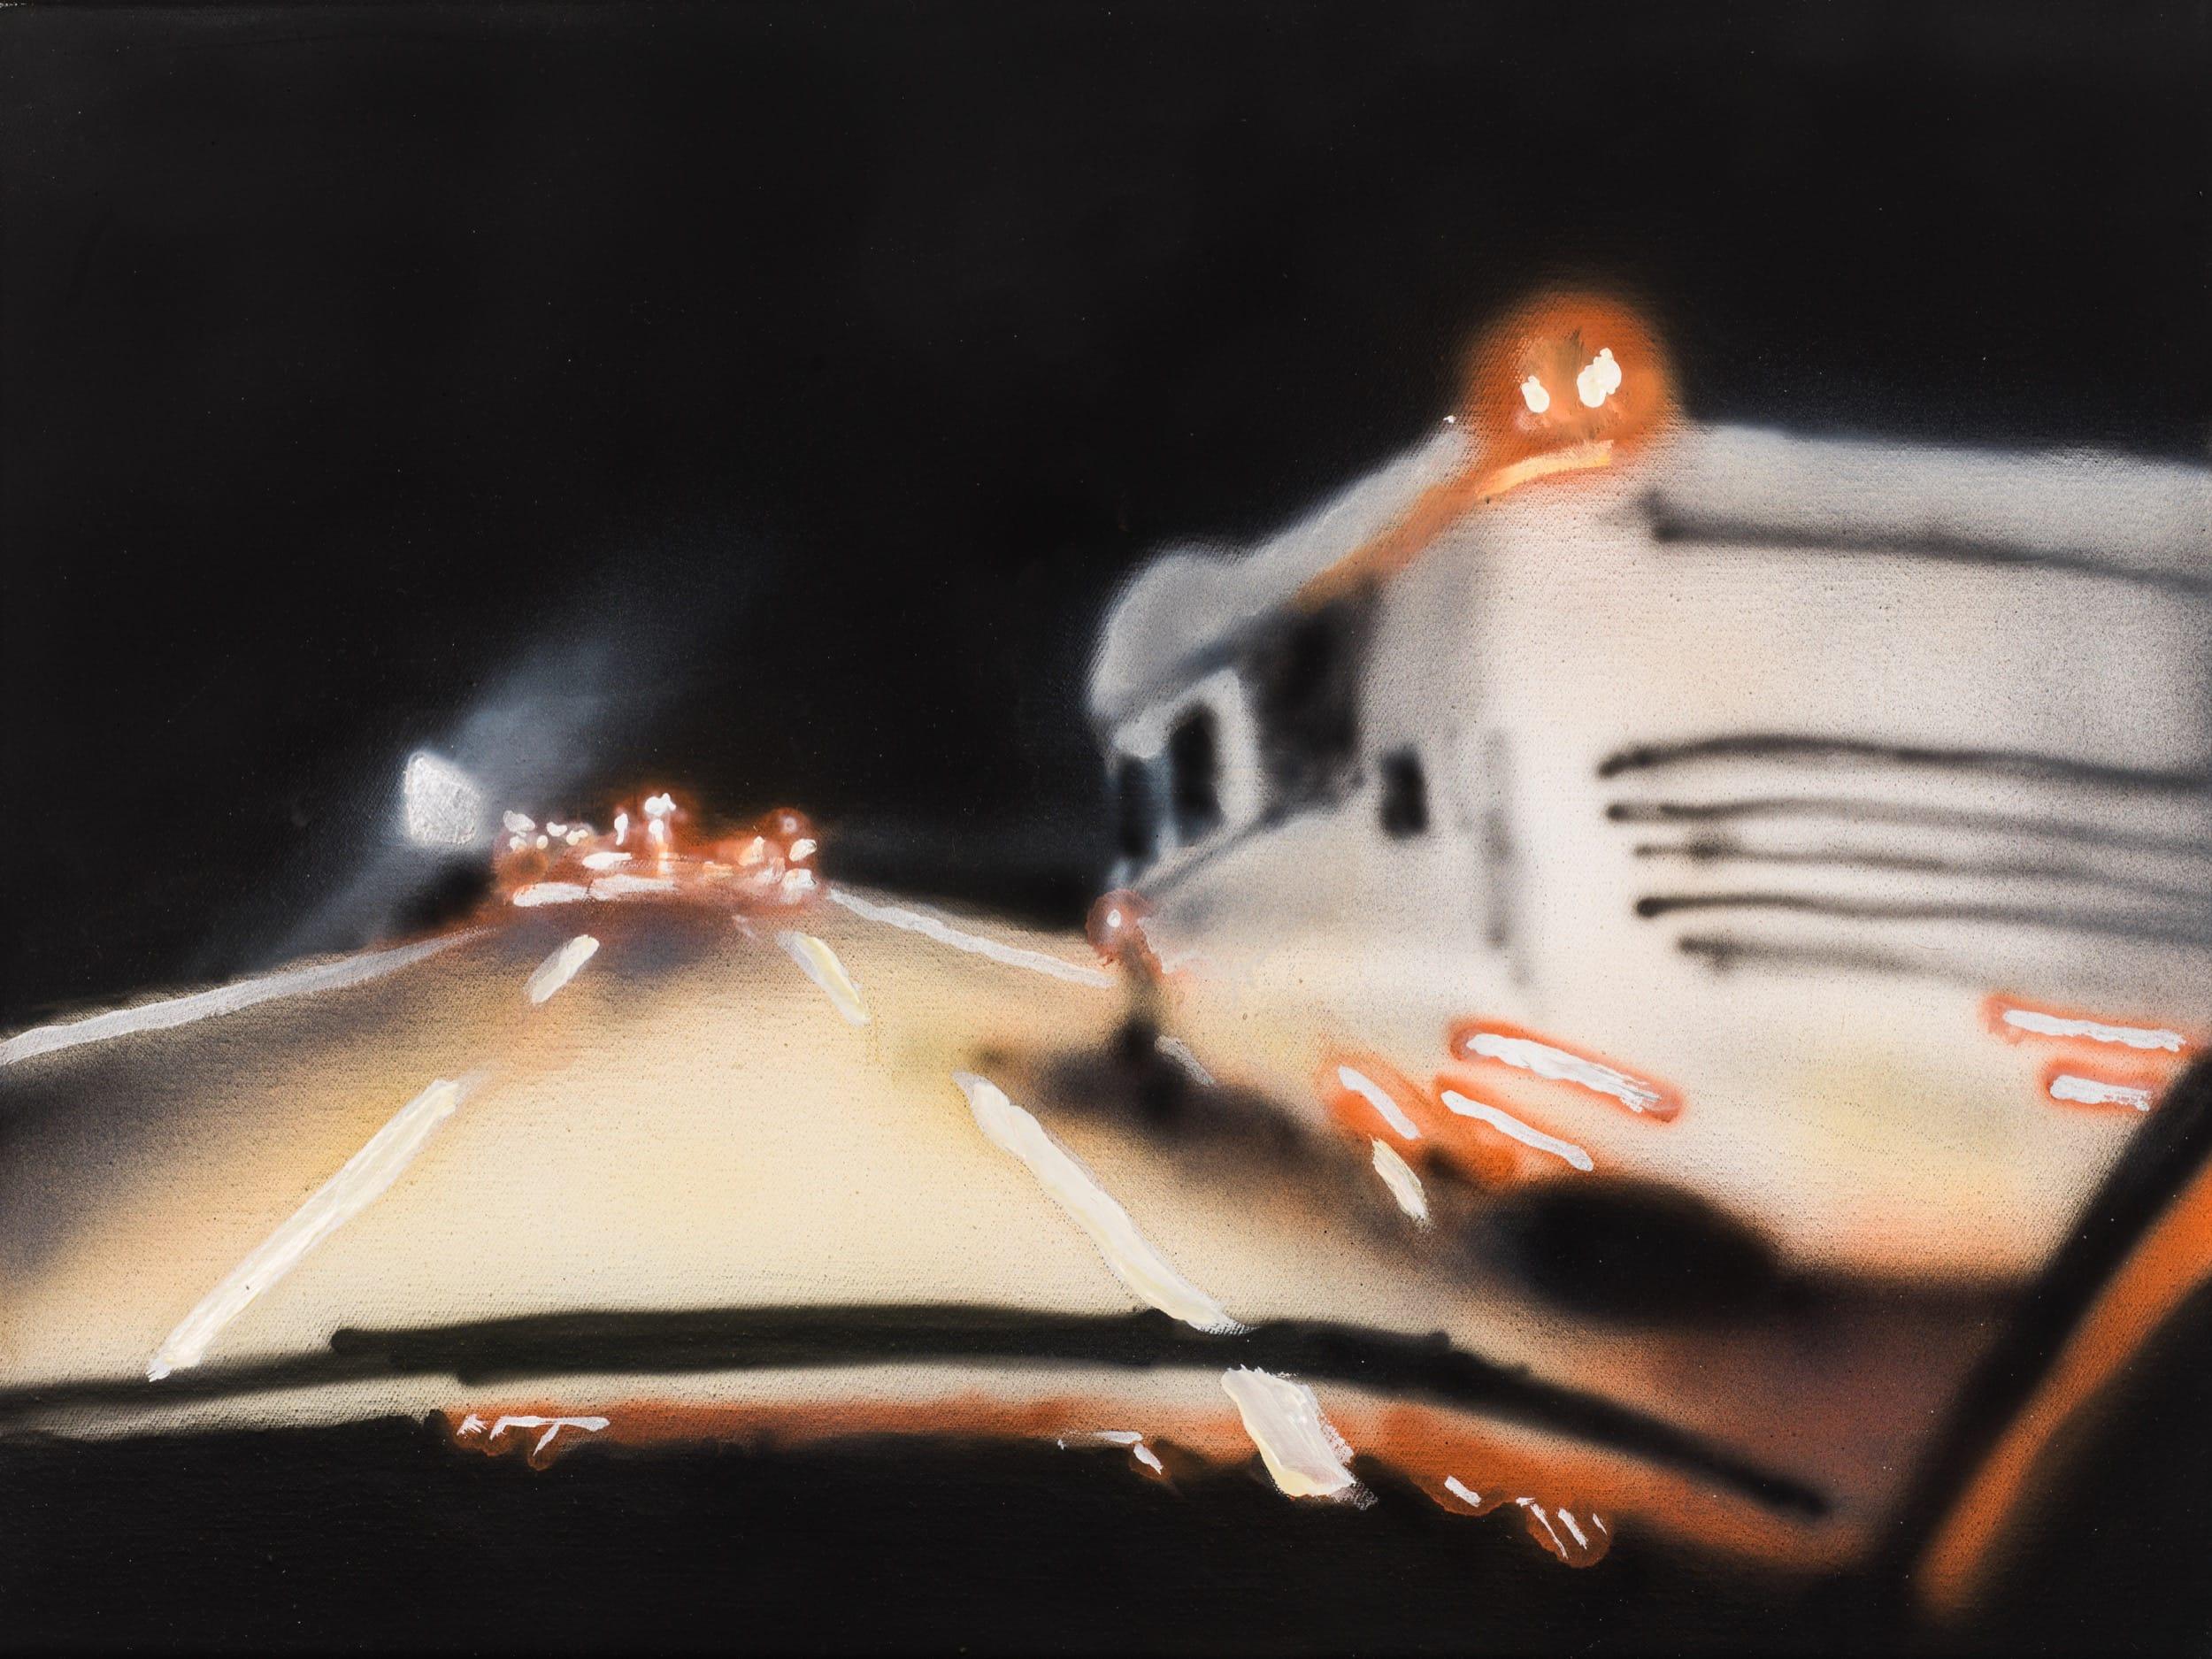 A2 - Wohnmobile.  Oil on canvas, 40 x 30 cm,  2019